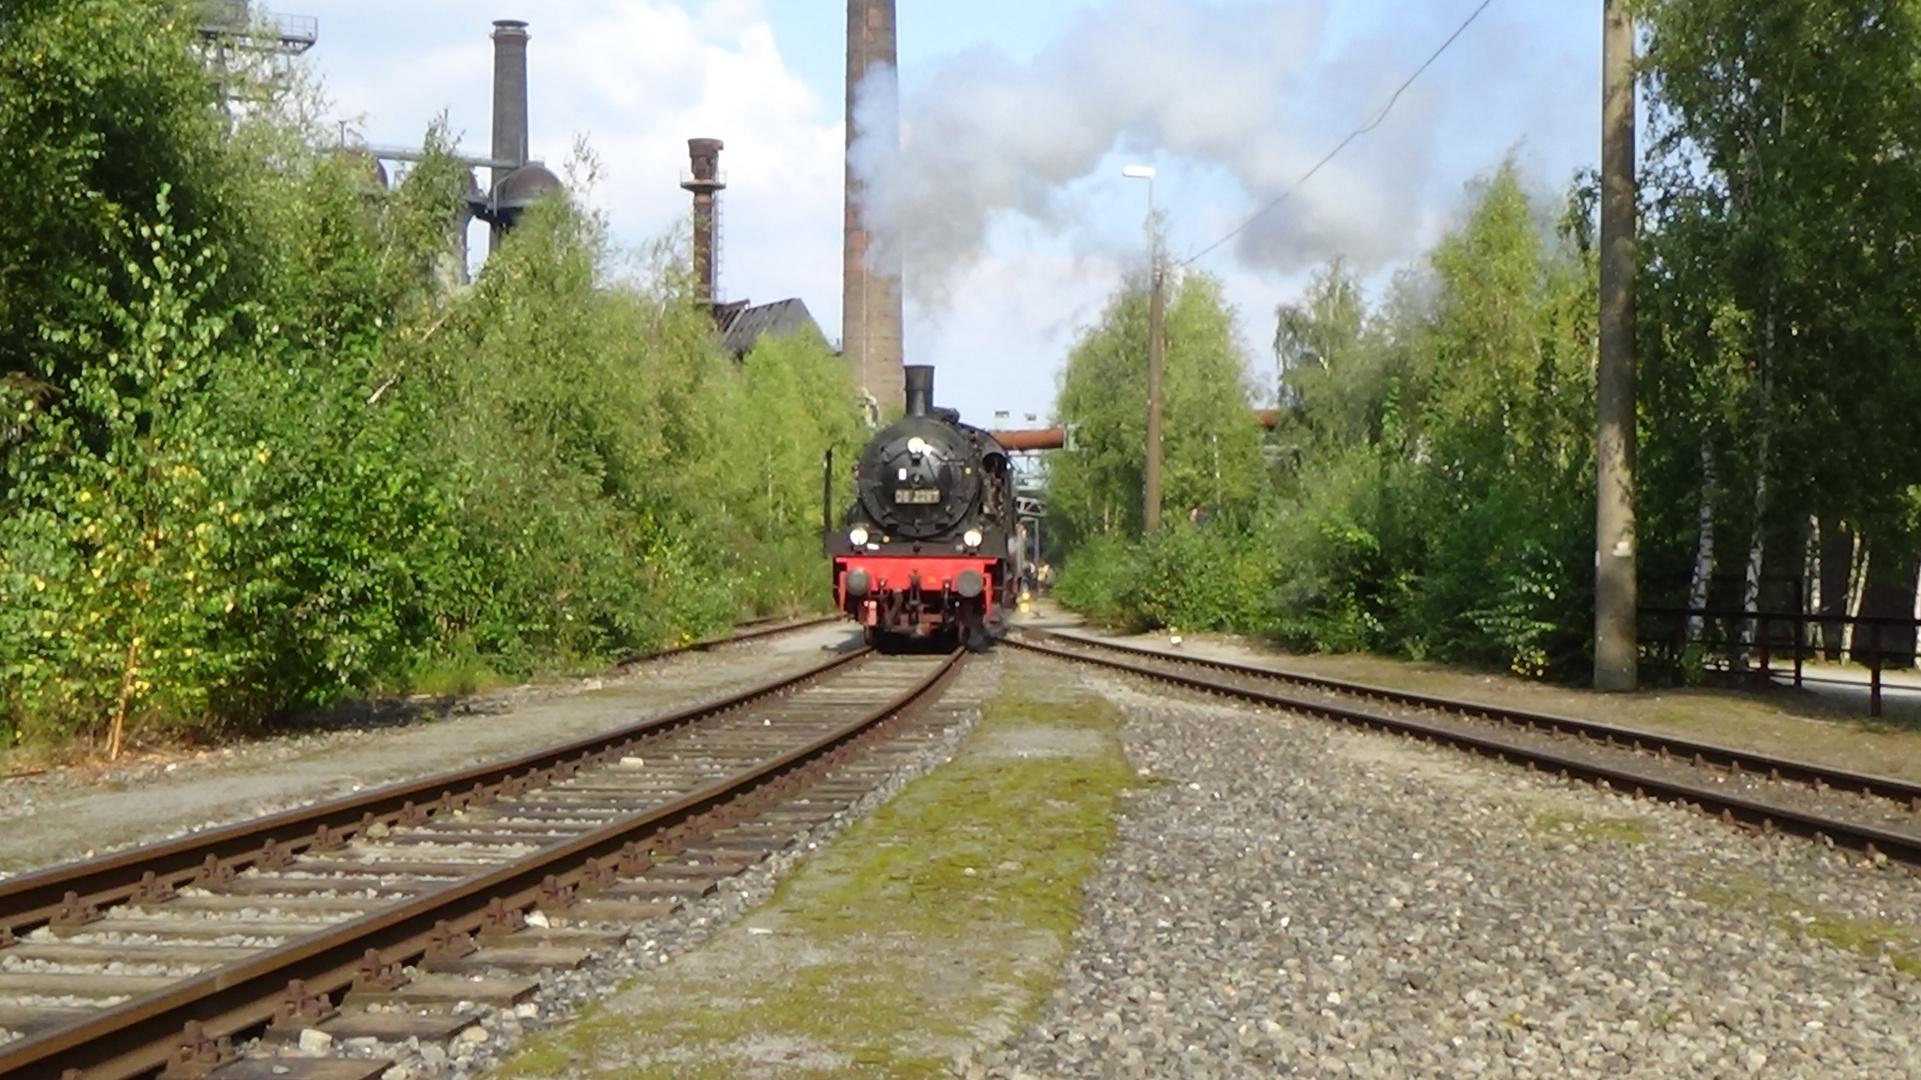 38 2267 im Landschaftspark Duisburg Nord